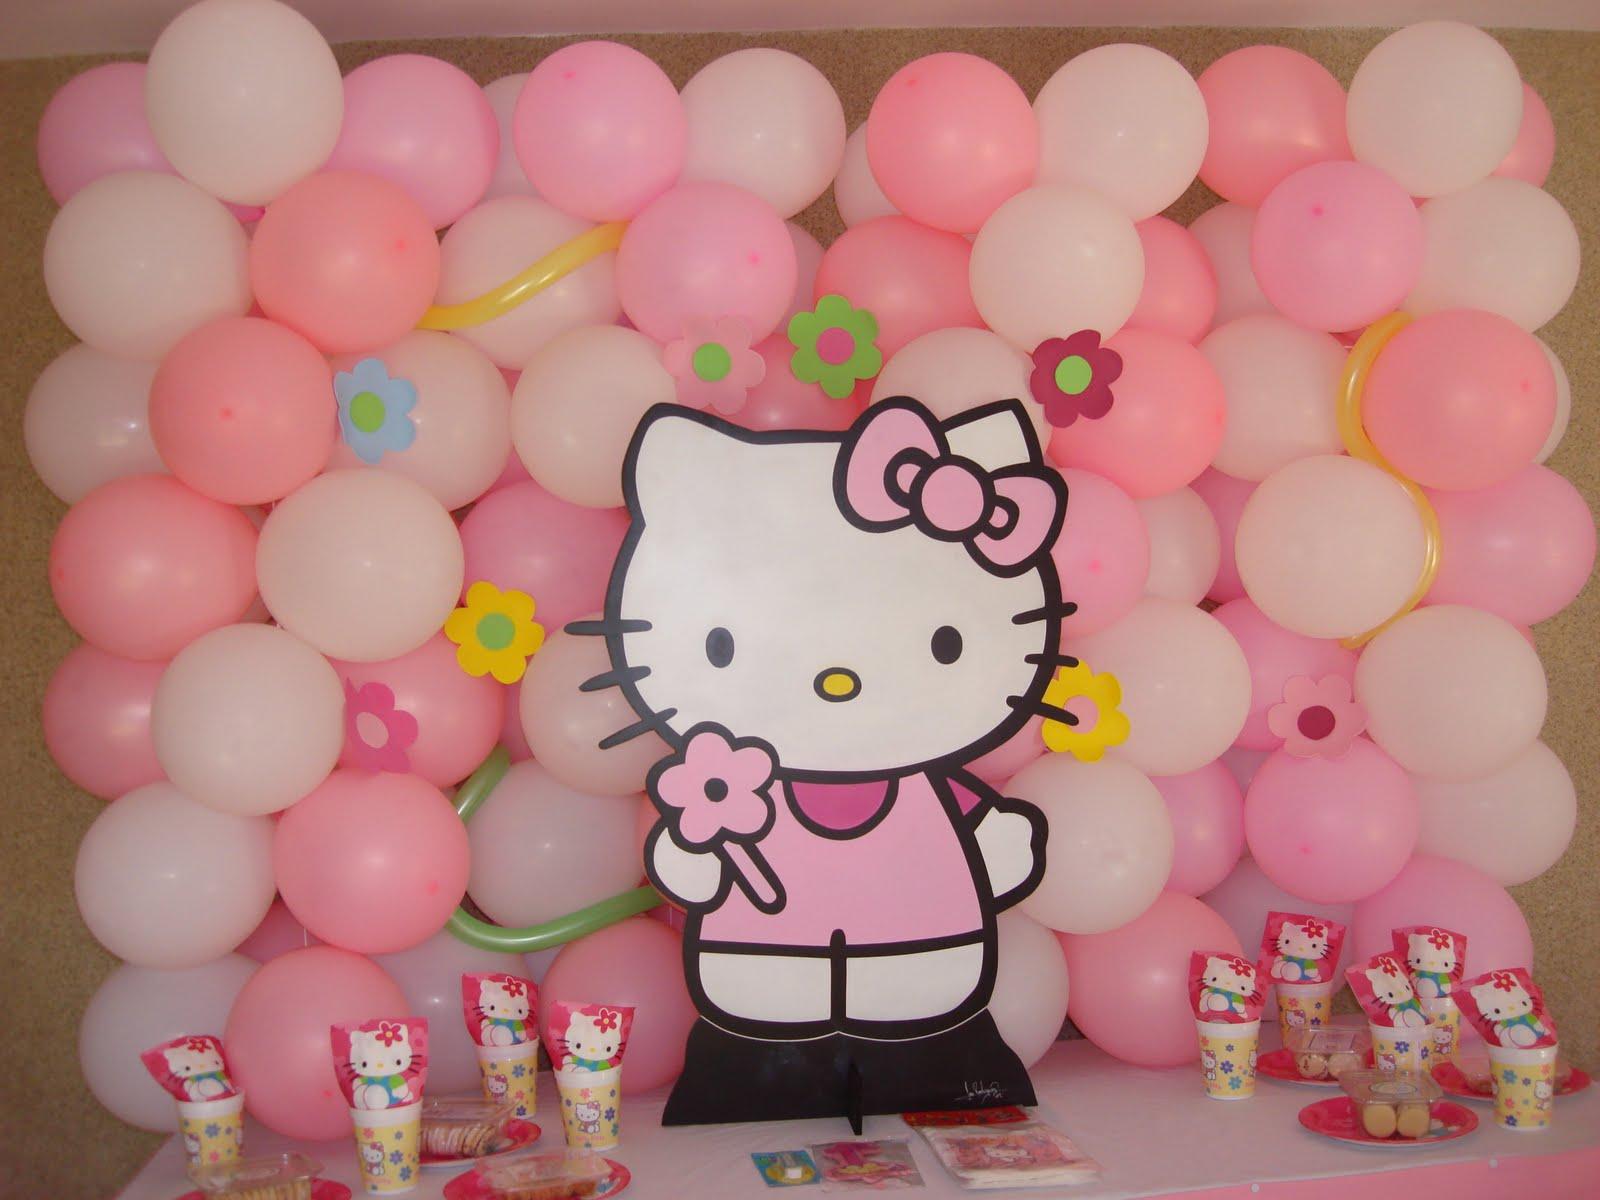 Decoraciones de hello kitty car interior design - Decoracion hello kitty ...